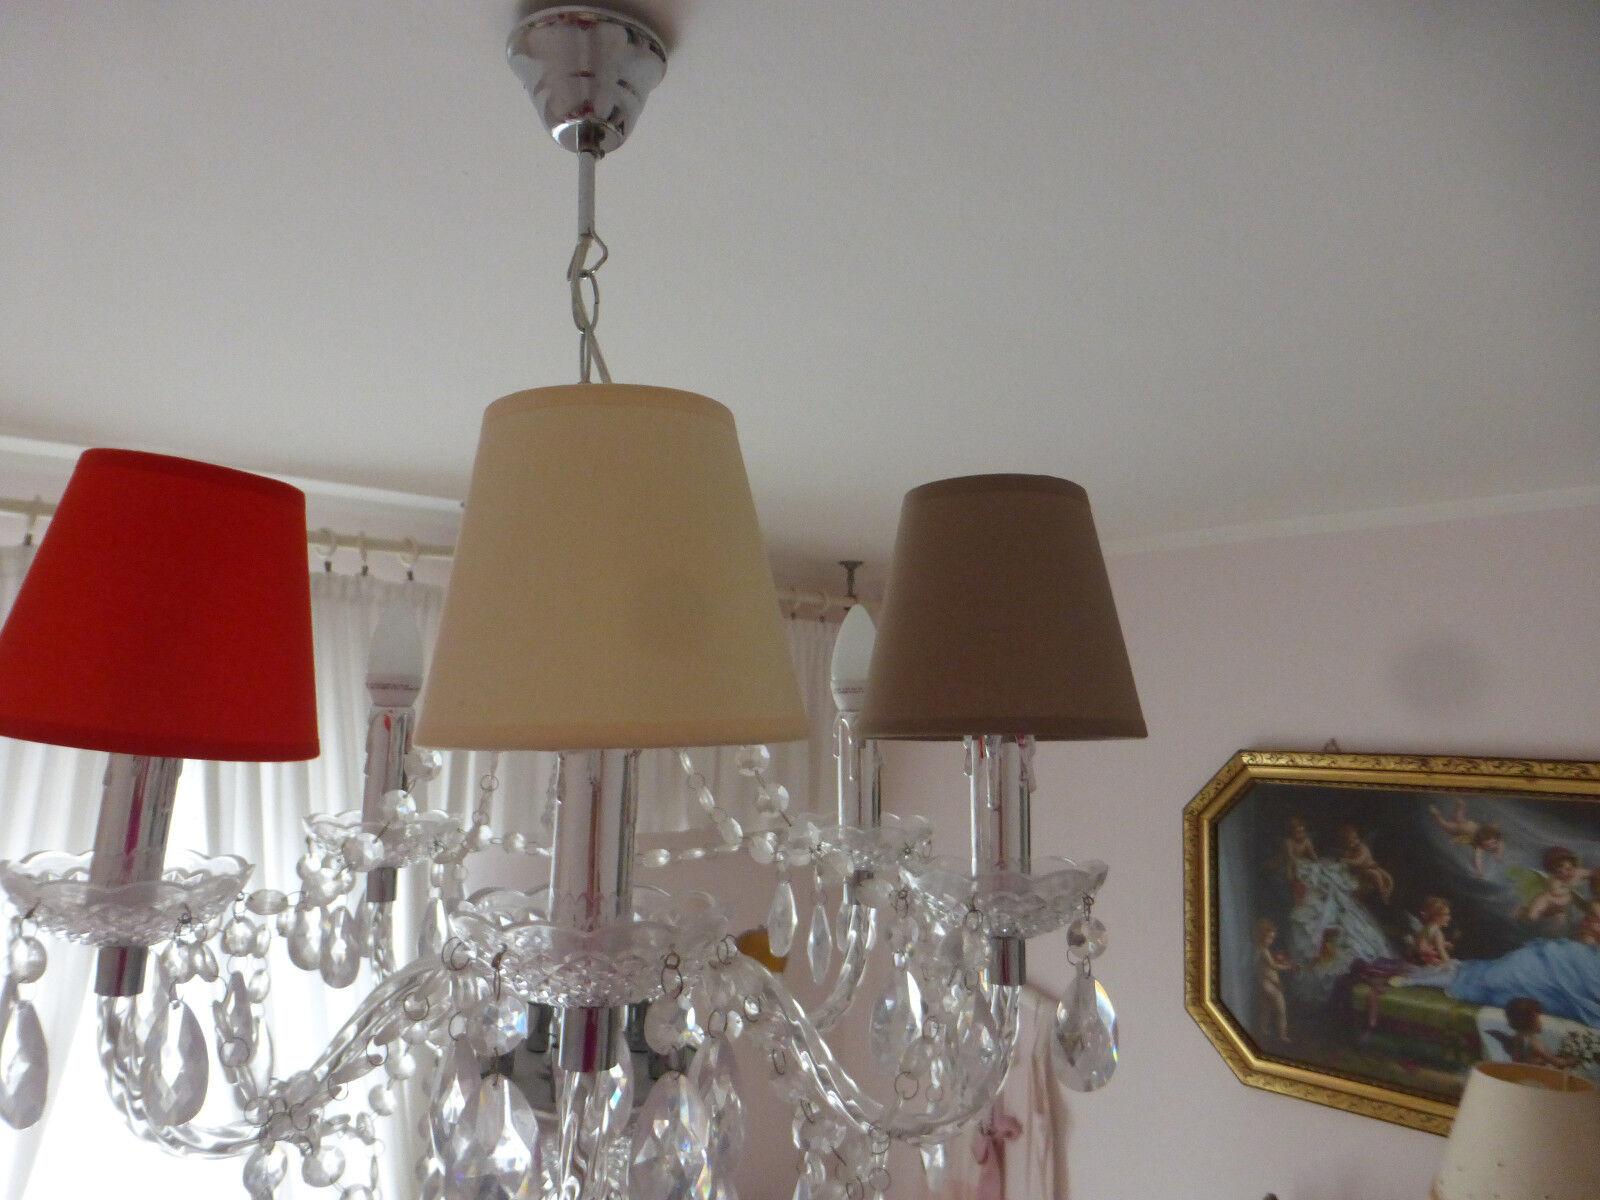 Lampenschirm Klemmschirm Creme, Braun Taupe .14x9x12cm Kronleuchter Lüster Clip